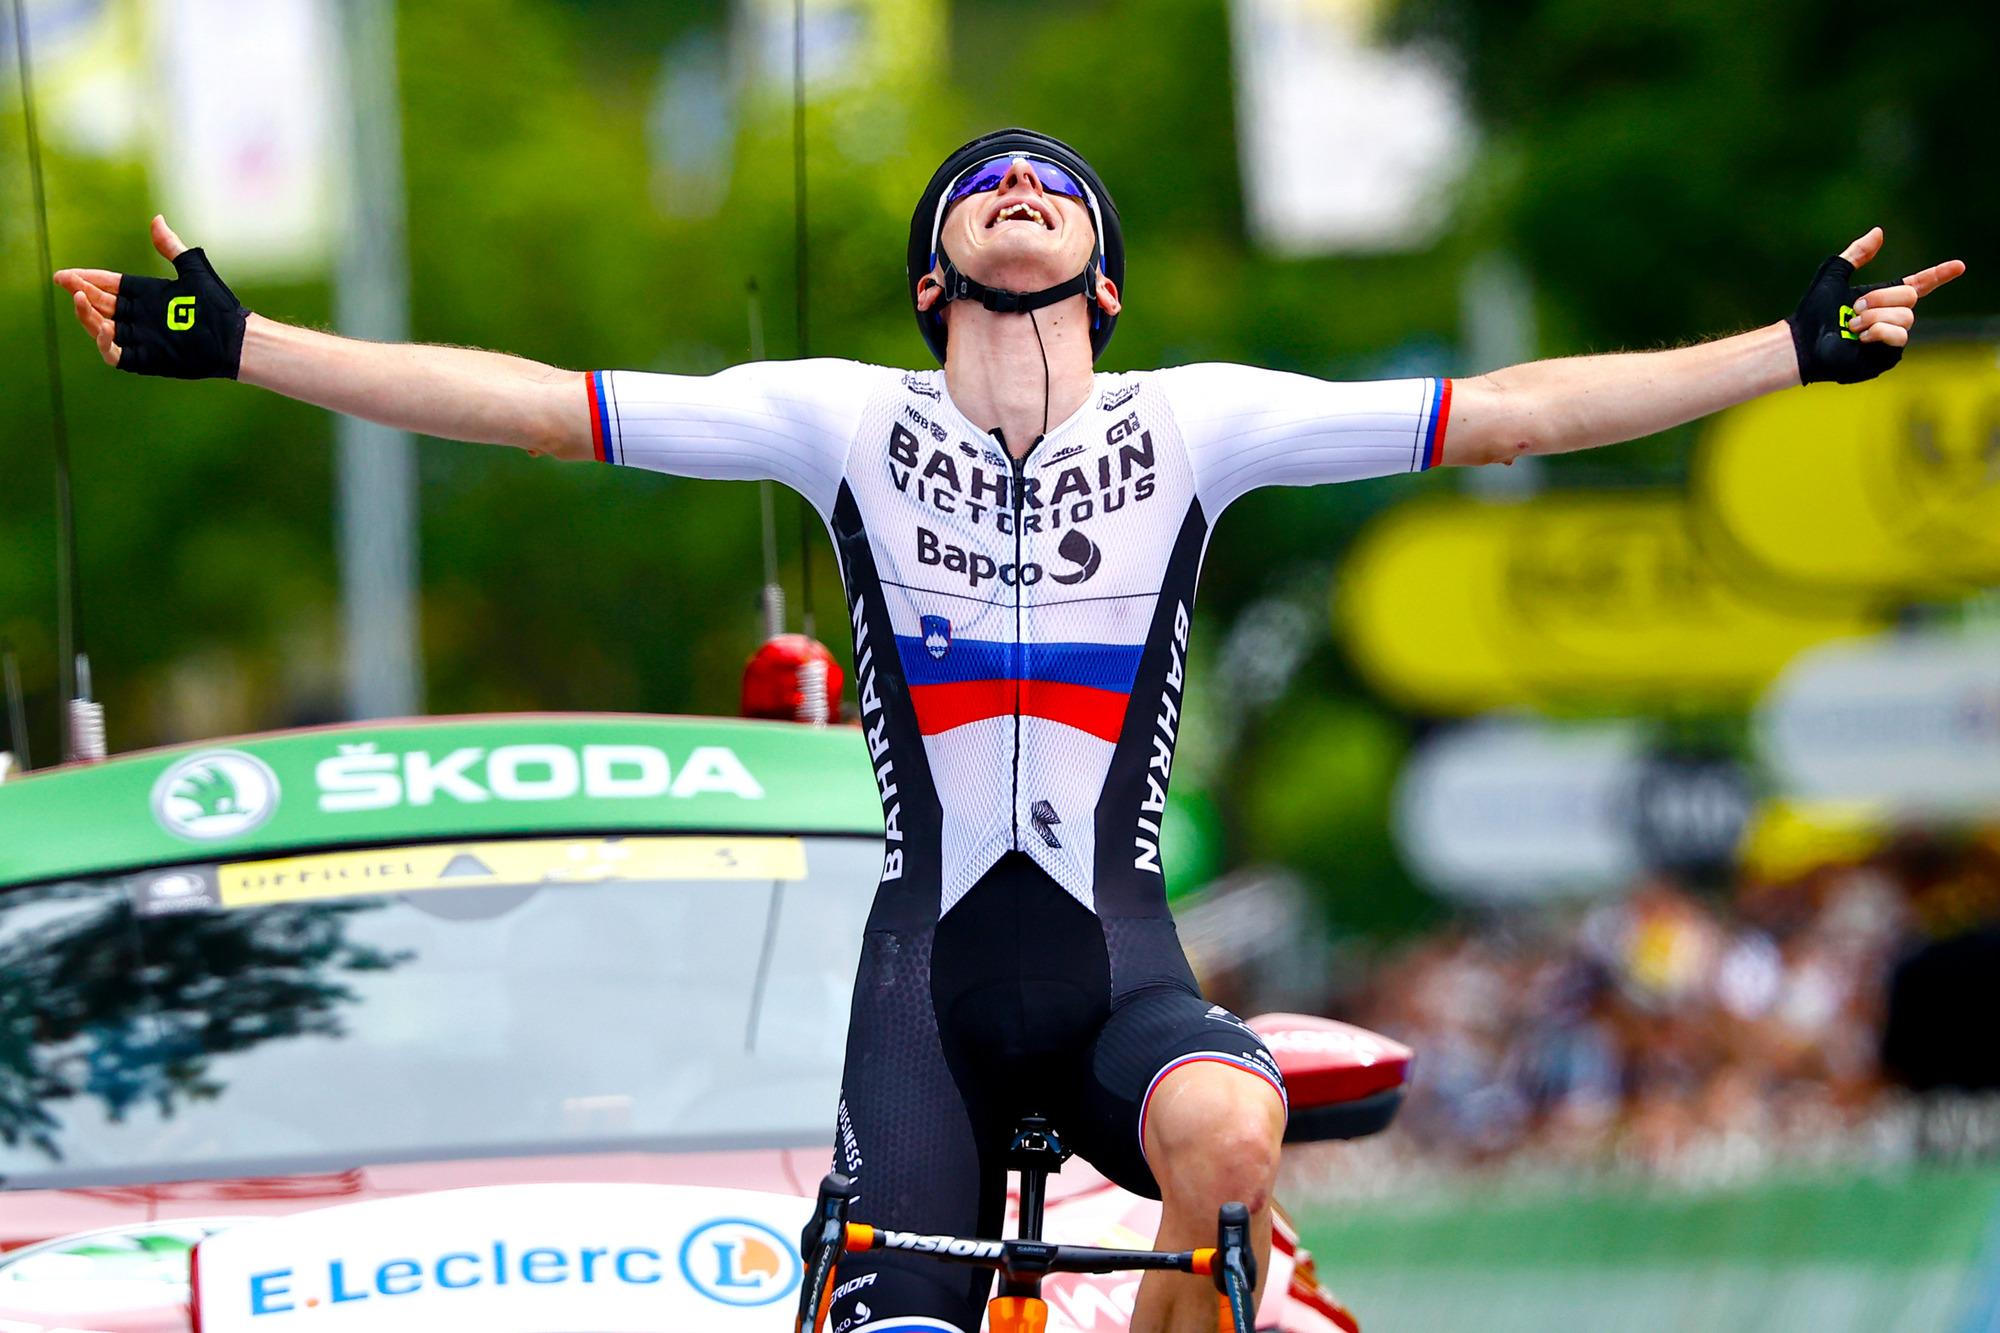 Tour de France 2021 - 108th Edition - 7th stage Vierzon - Le Creusot 249,1 km - 02/07/2021 - Matej Mohoric (SLO - Bahrain Victorious) - photo Luca Bettini/BettiniPhoto©2021